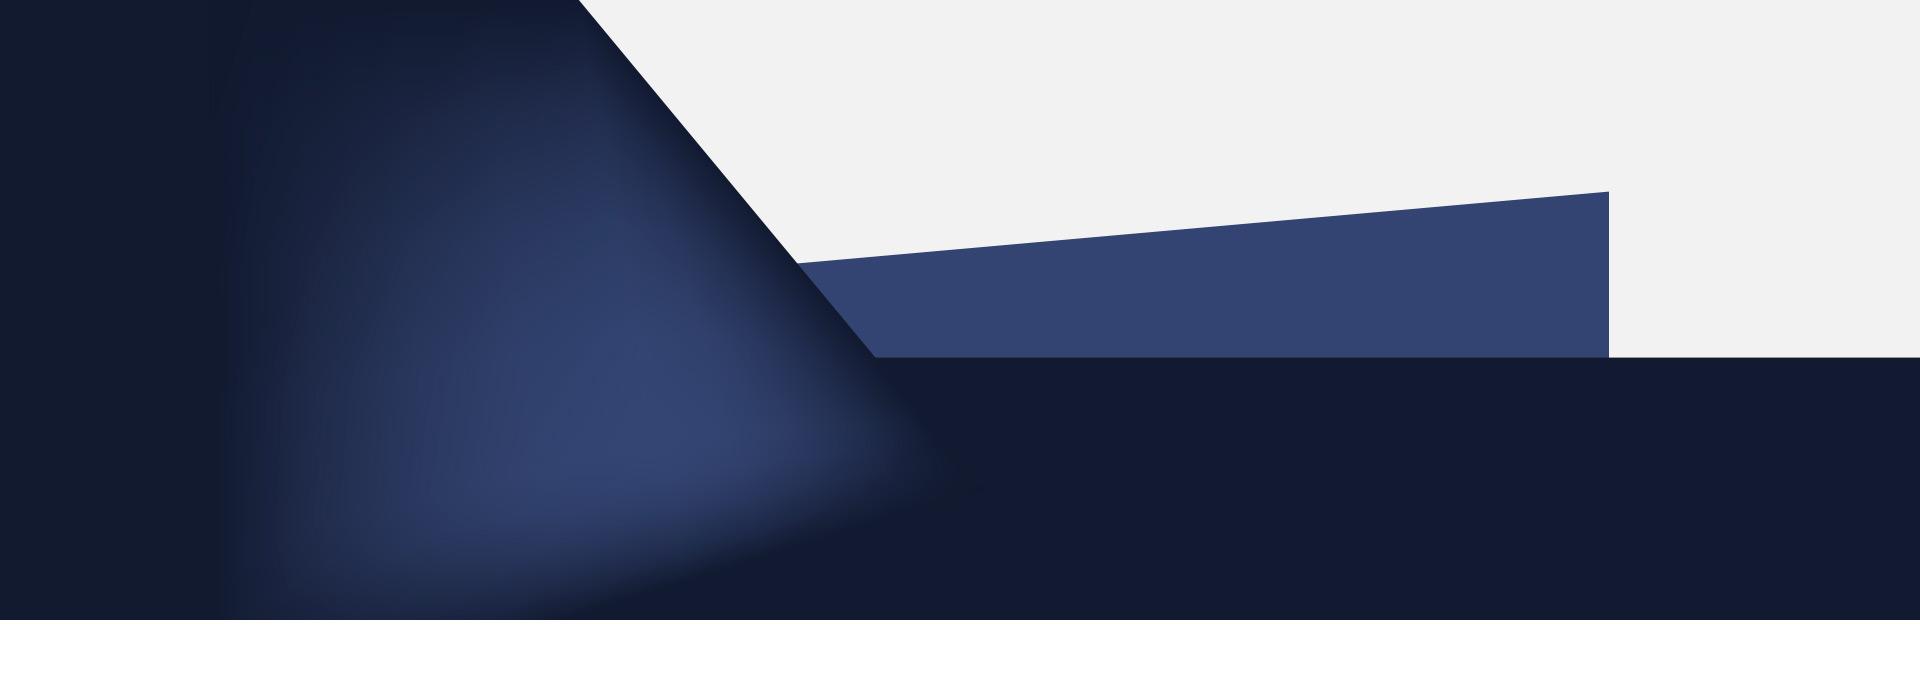 http://www.uned.ac.cr/sites/default/files/revslider/image/encuesta_guesss_bg.jpg